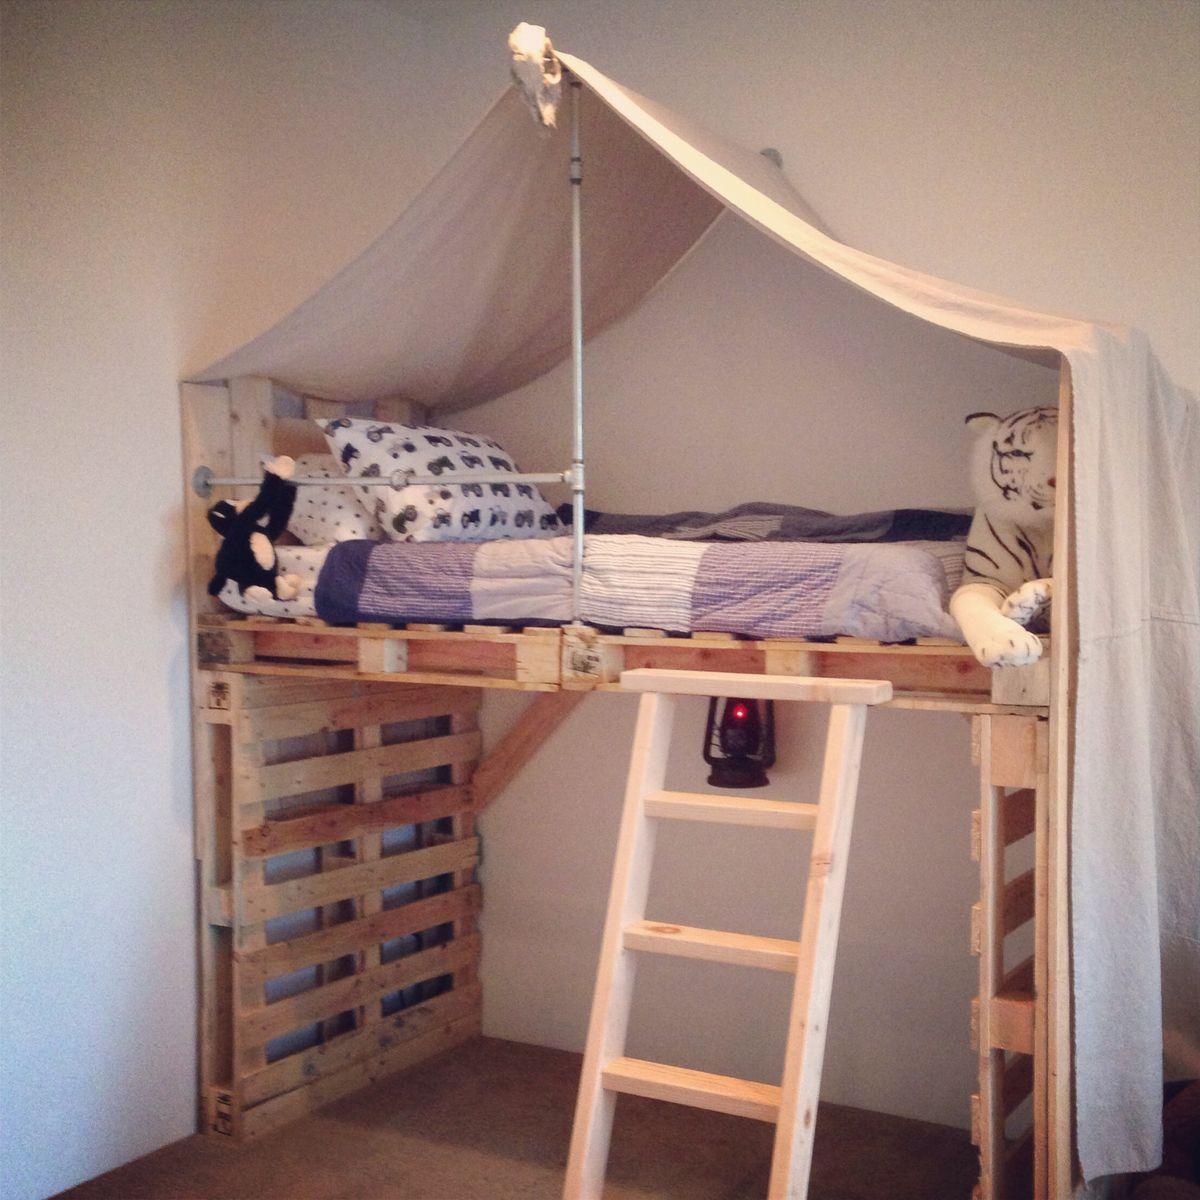 Loft bed design ideas  baffddddaaccg  pixels  DIY and